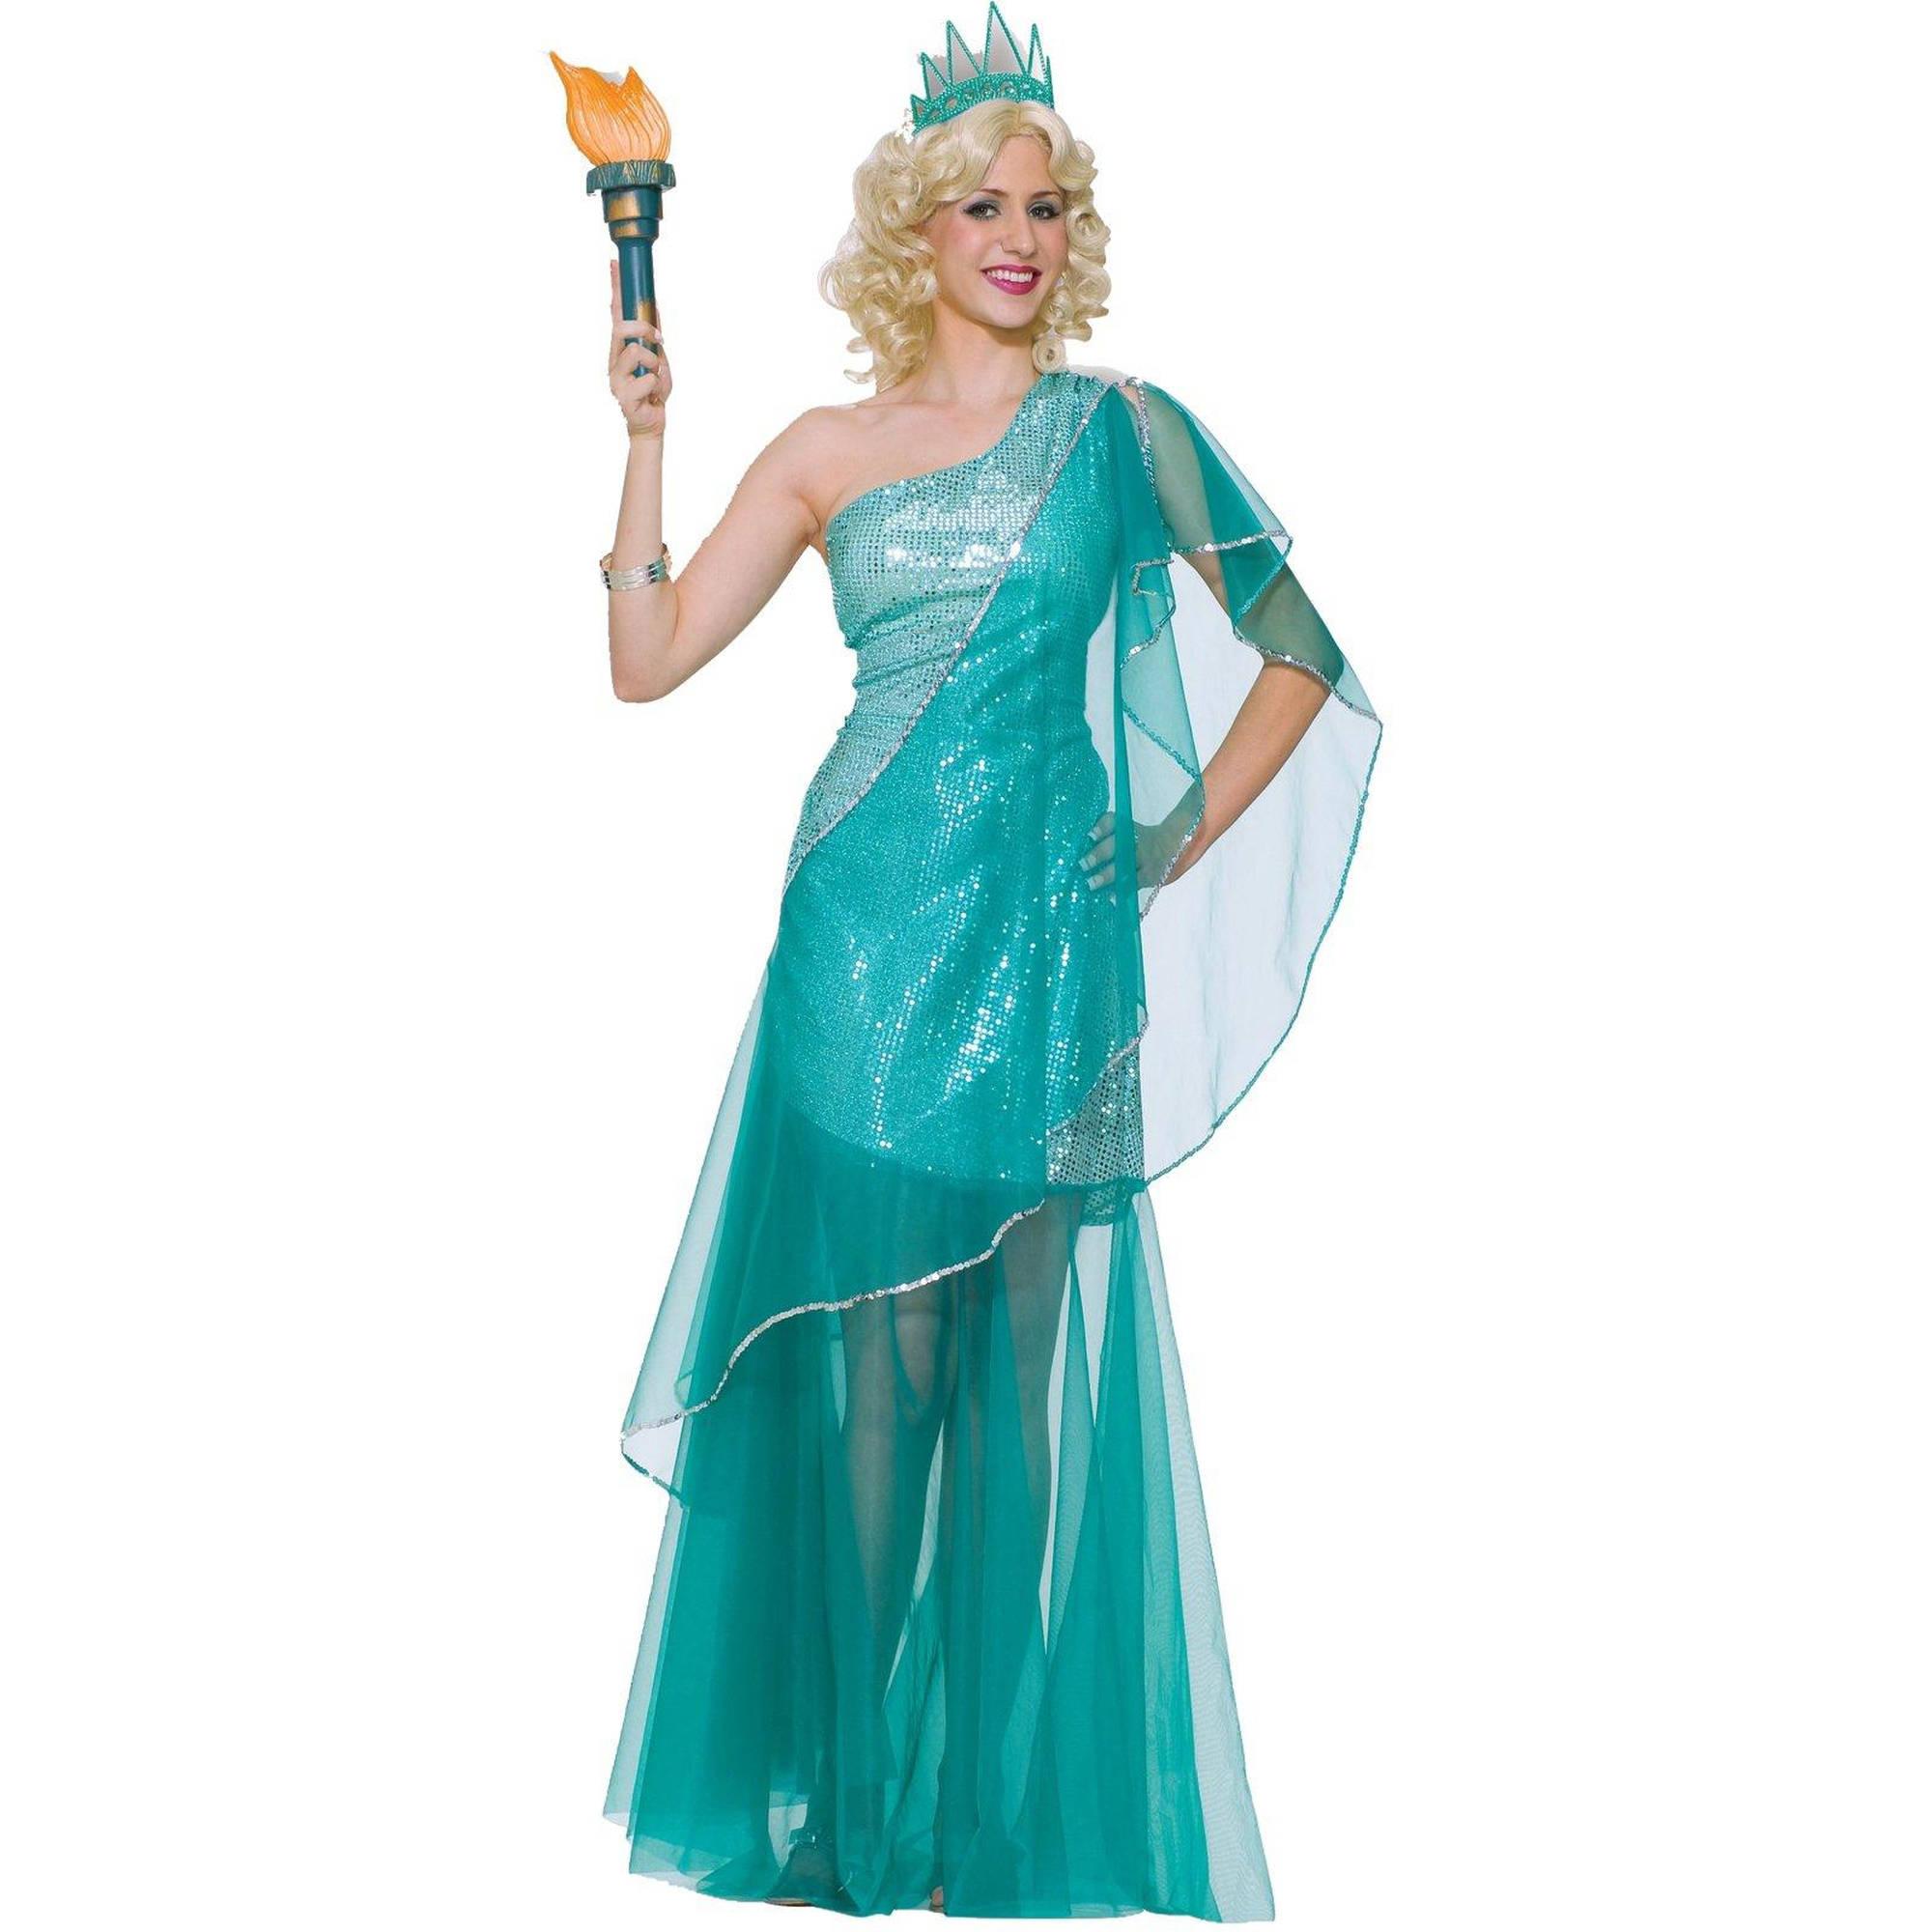 Sassy Miss Liberty Women's Adult Halloween Costume, 1 Size